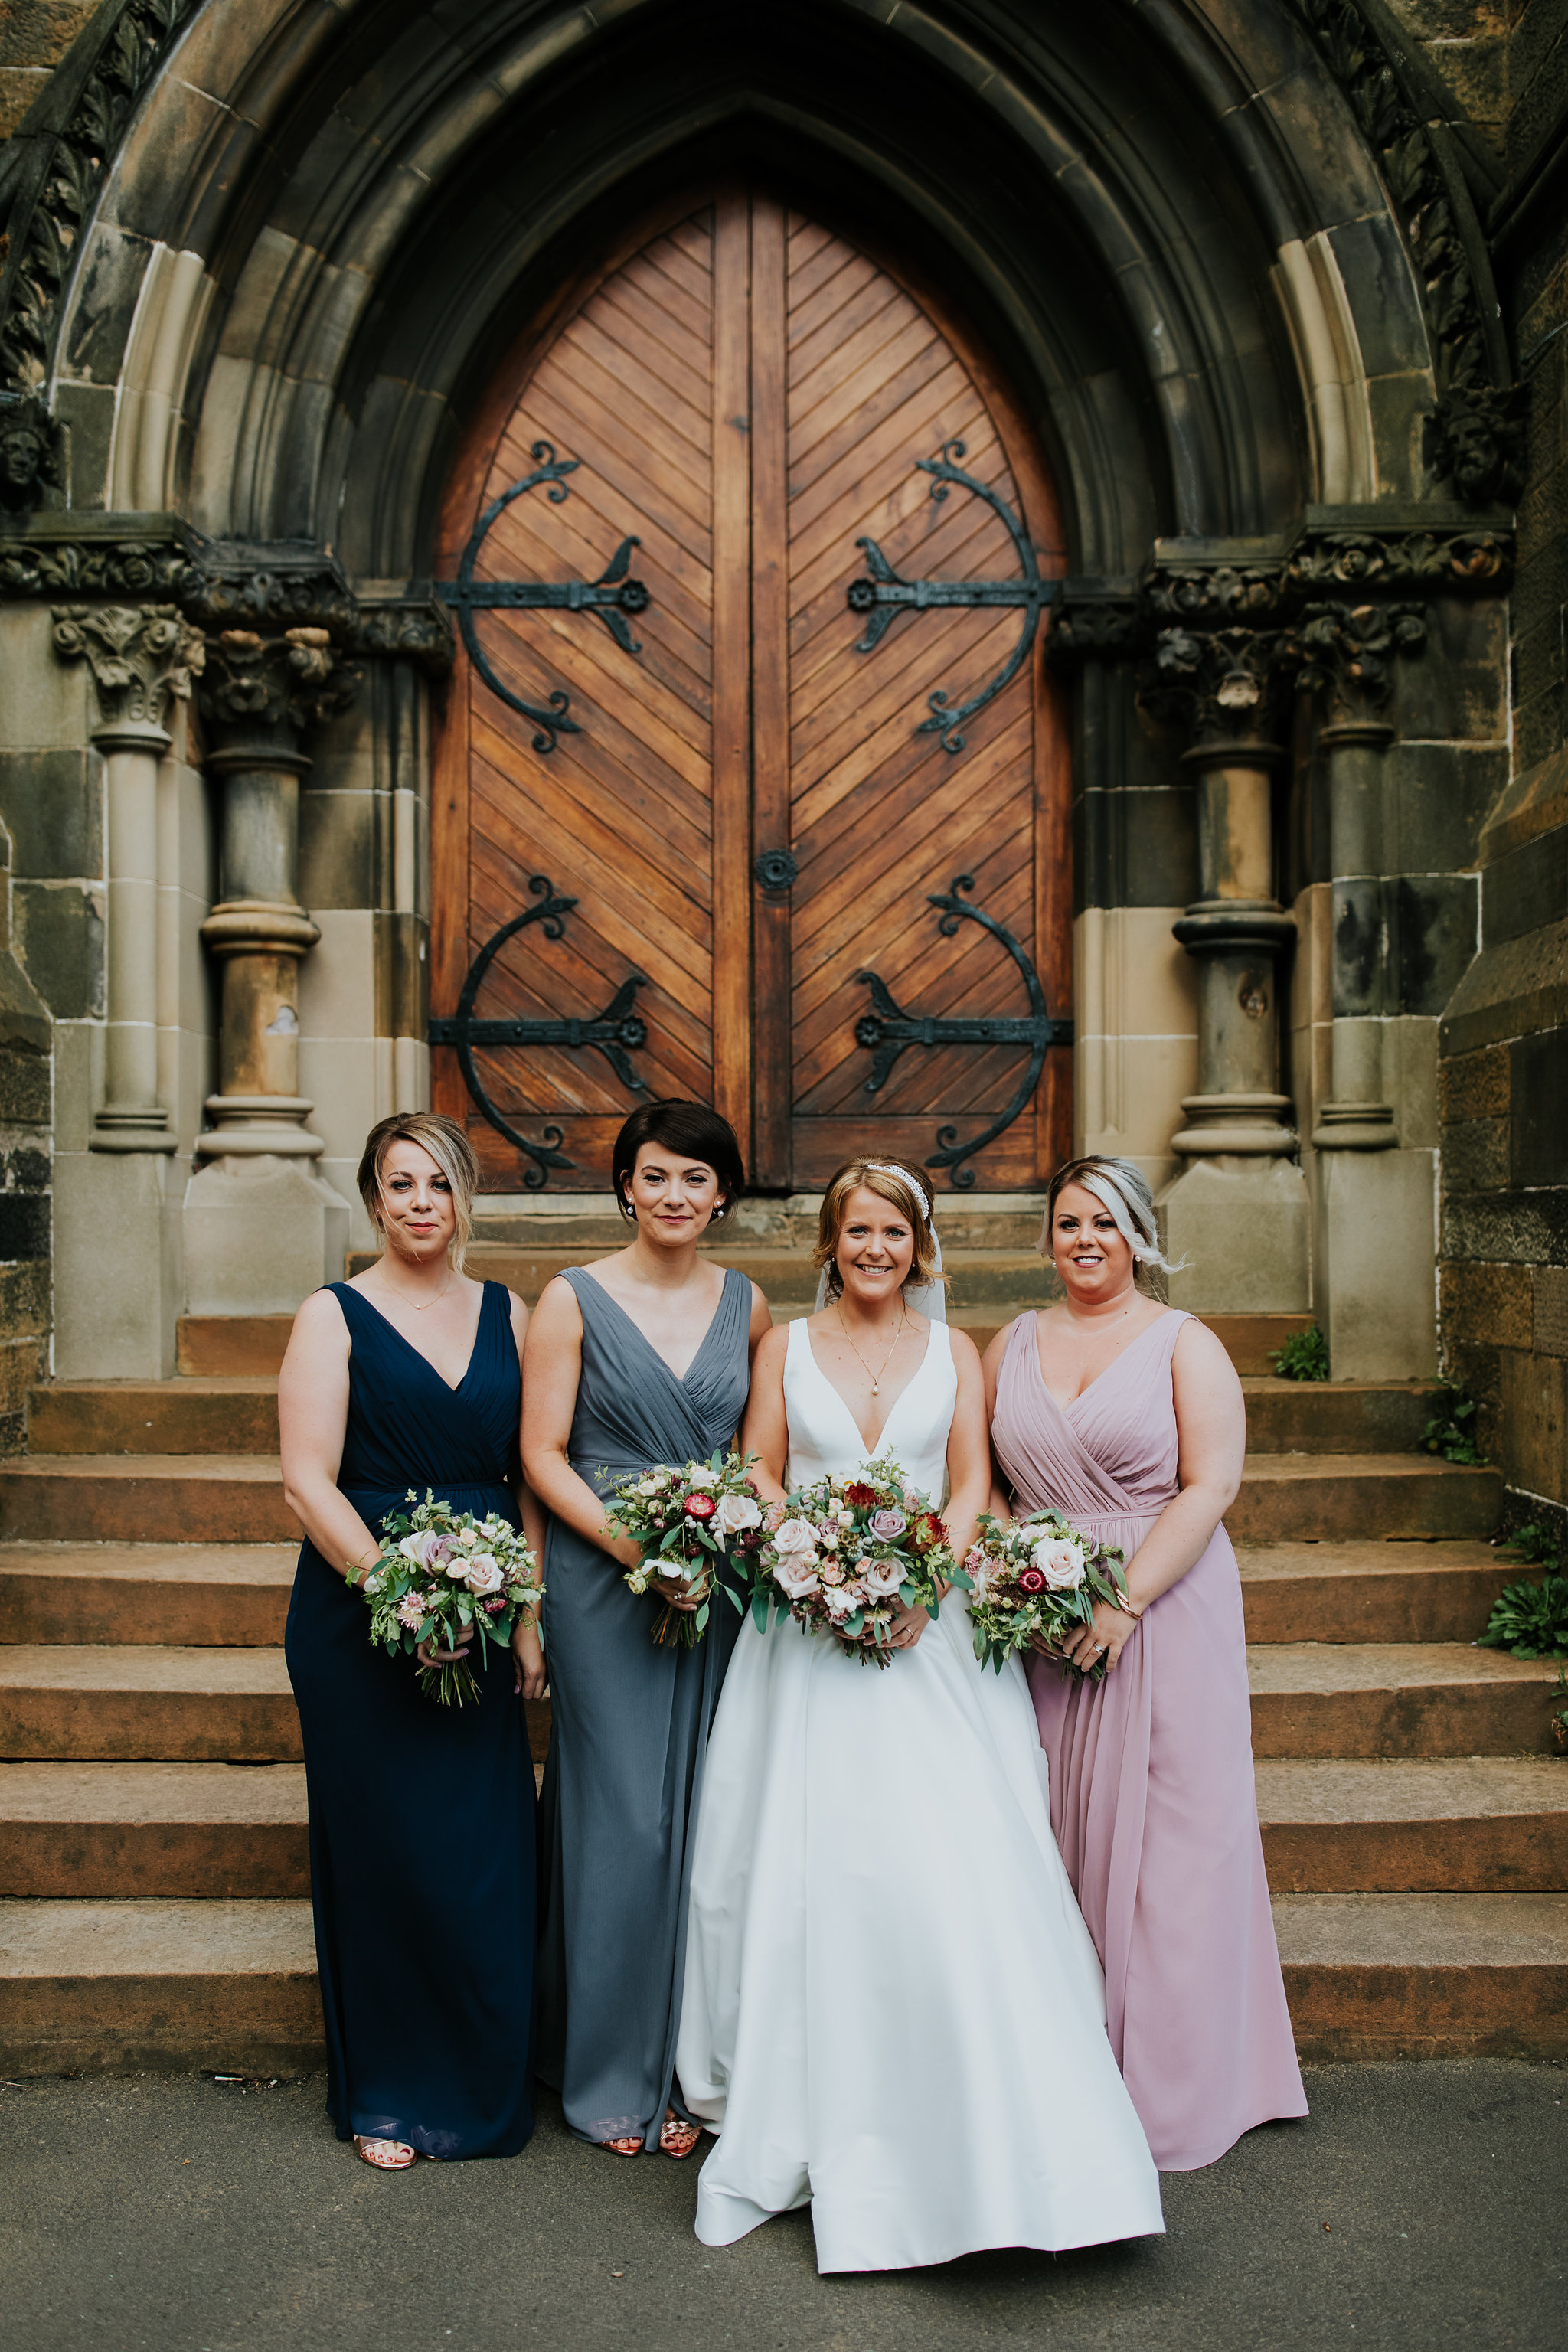 Cottiers wedding lavender and rose wedding florists scotland10.jpg